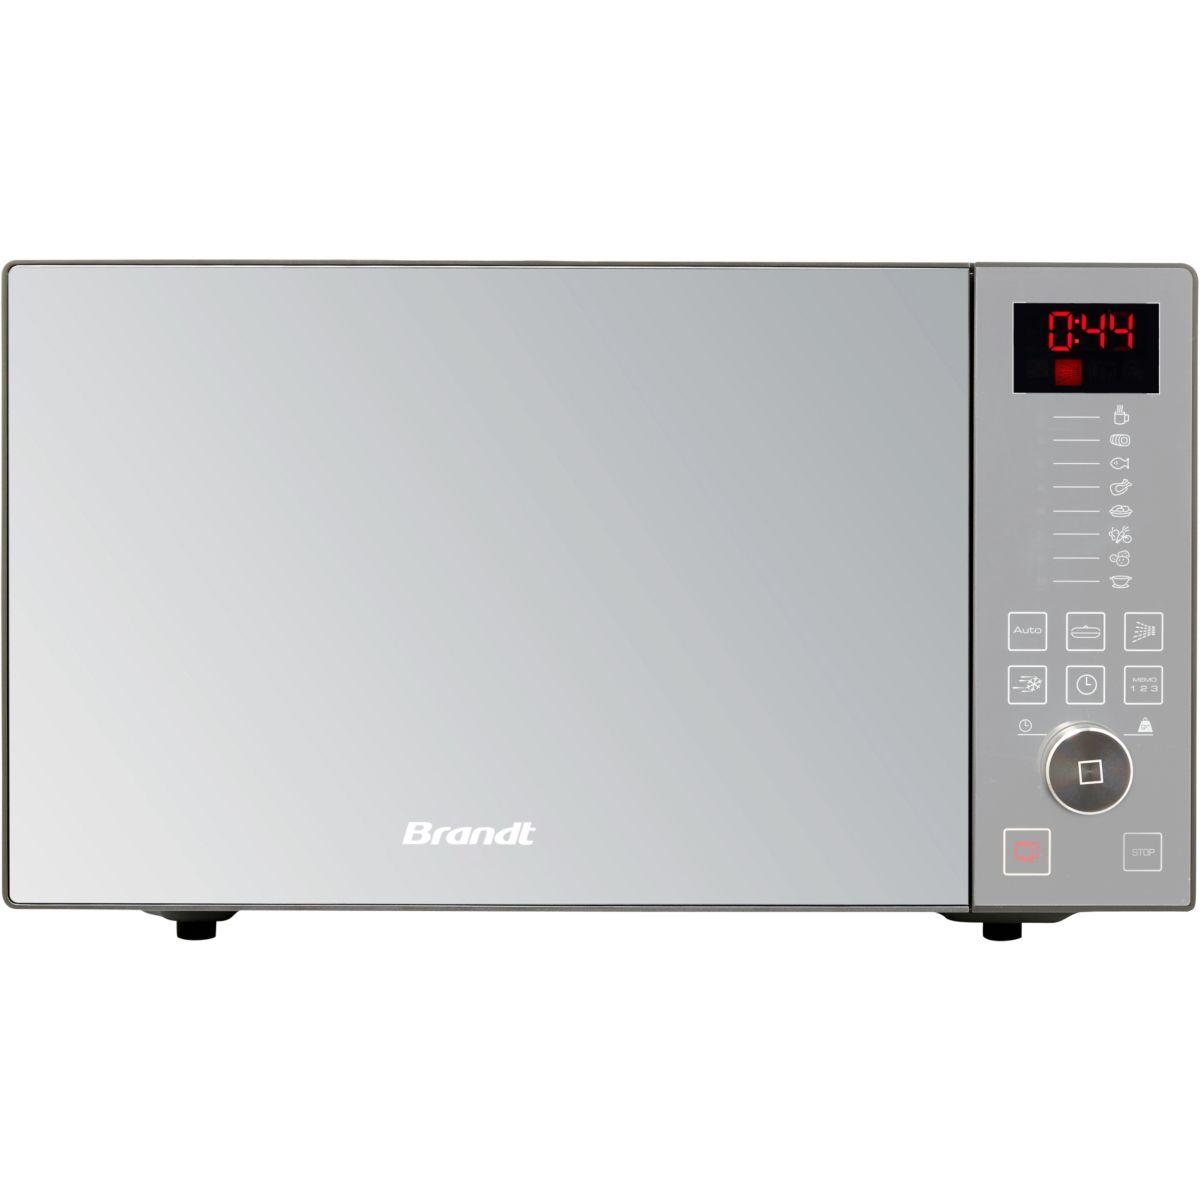 Micro-onde monofonction BRANDT SE2616ES